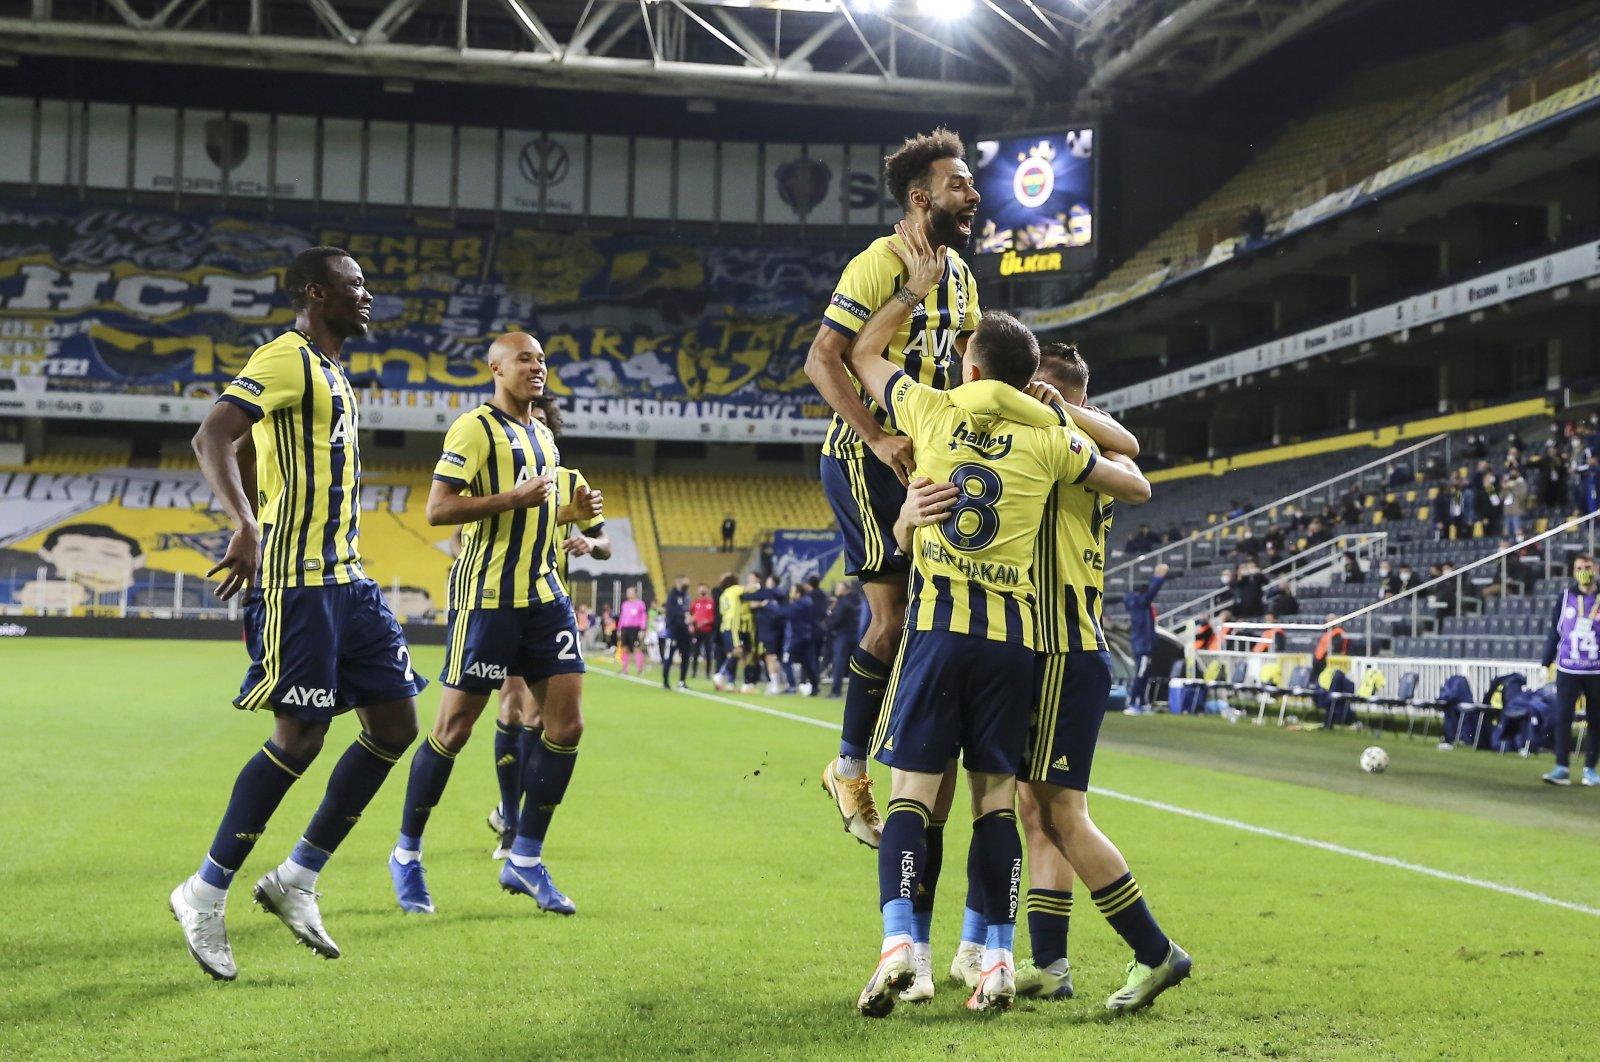 Fenerbahçe players celebrate a goal against Alanyaspor in a Turkish Süper Lig match at Ülker Stadium, Istanbul, Turkey, Jan. 7, 2020. (AA Photo)